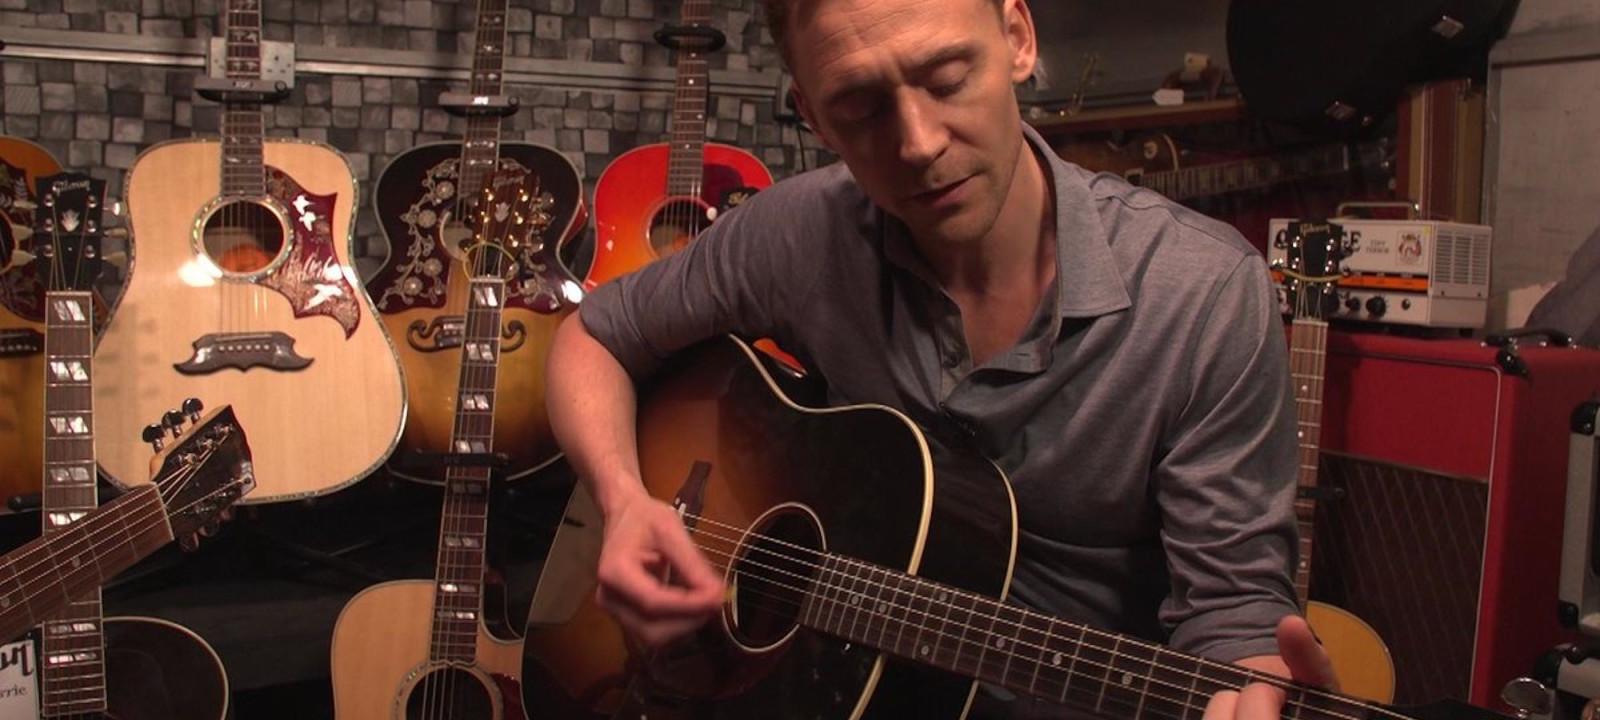 Tom Hiddleston plays guitar